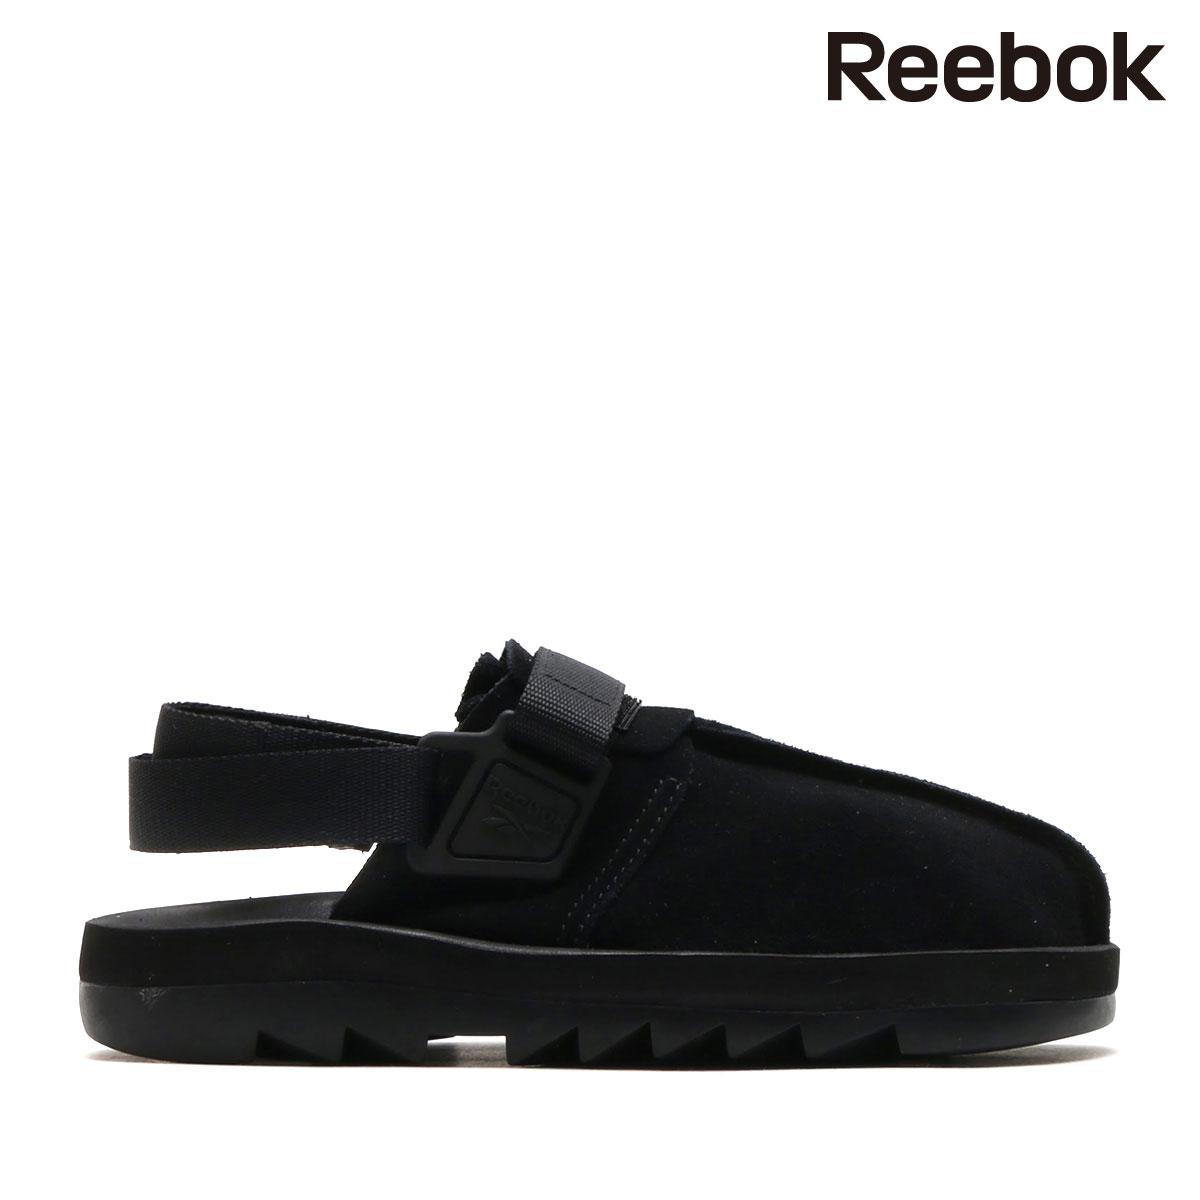 Reebok BEATNIK(BLACK/BLACK)(リーボック ビートニック)【メンズ】【レディース】【サンダル】【18SS-I】